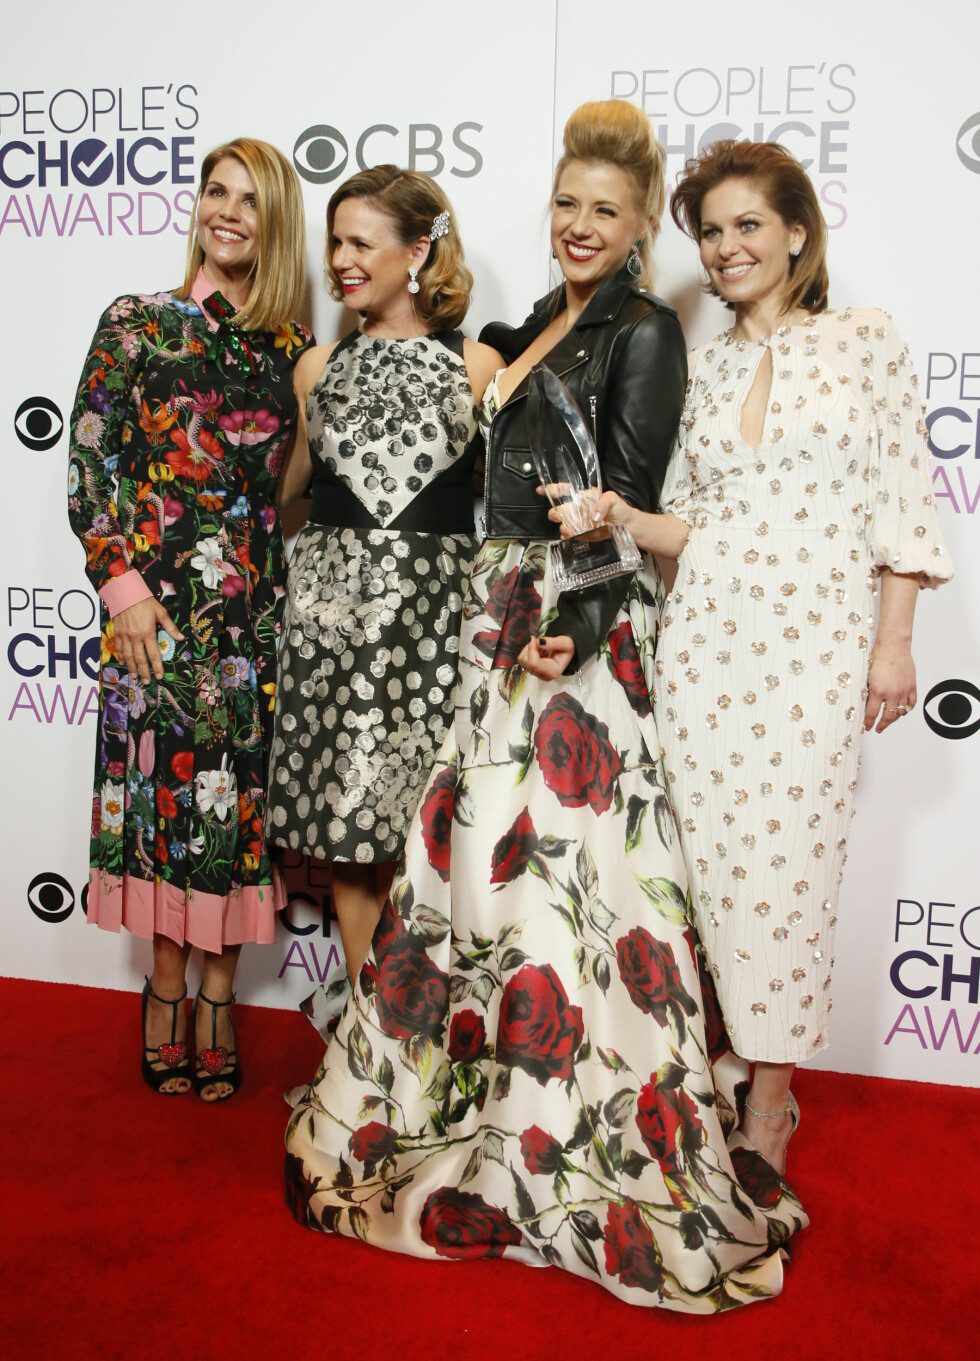 PEOPLE'S CHOICE AWARDS: Lori Laughlin, Andrea Barber, Jodie Sweetin og Candace Cameron Bure. Foto: Reuters